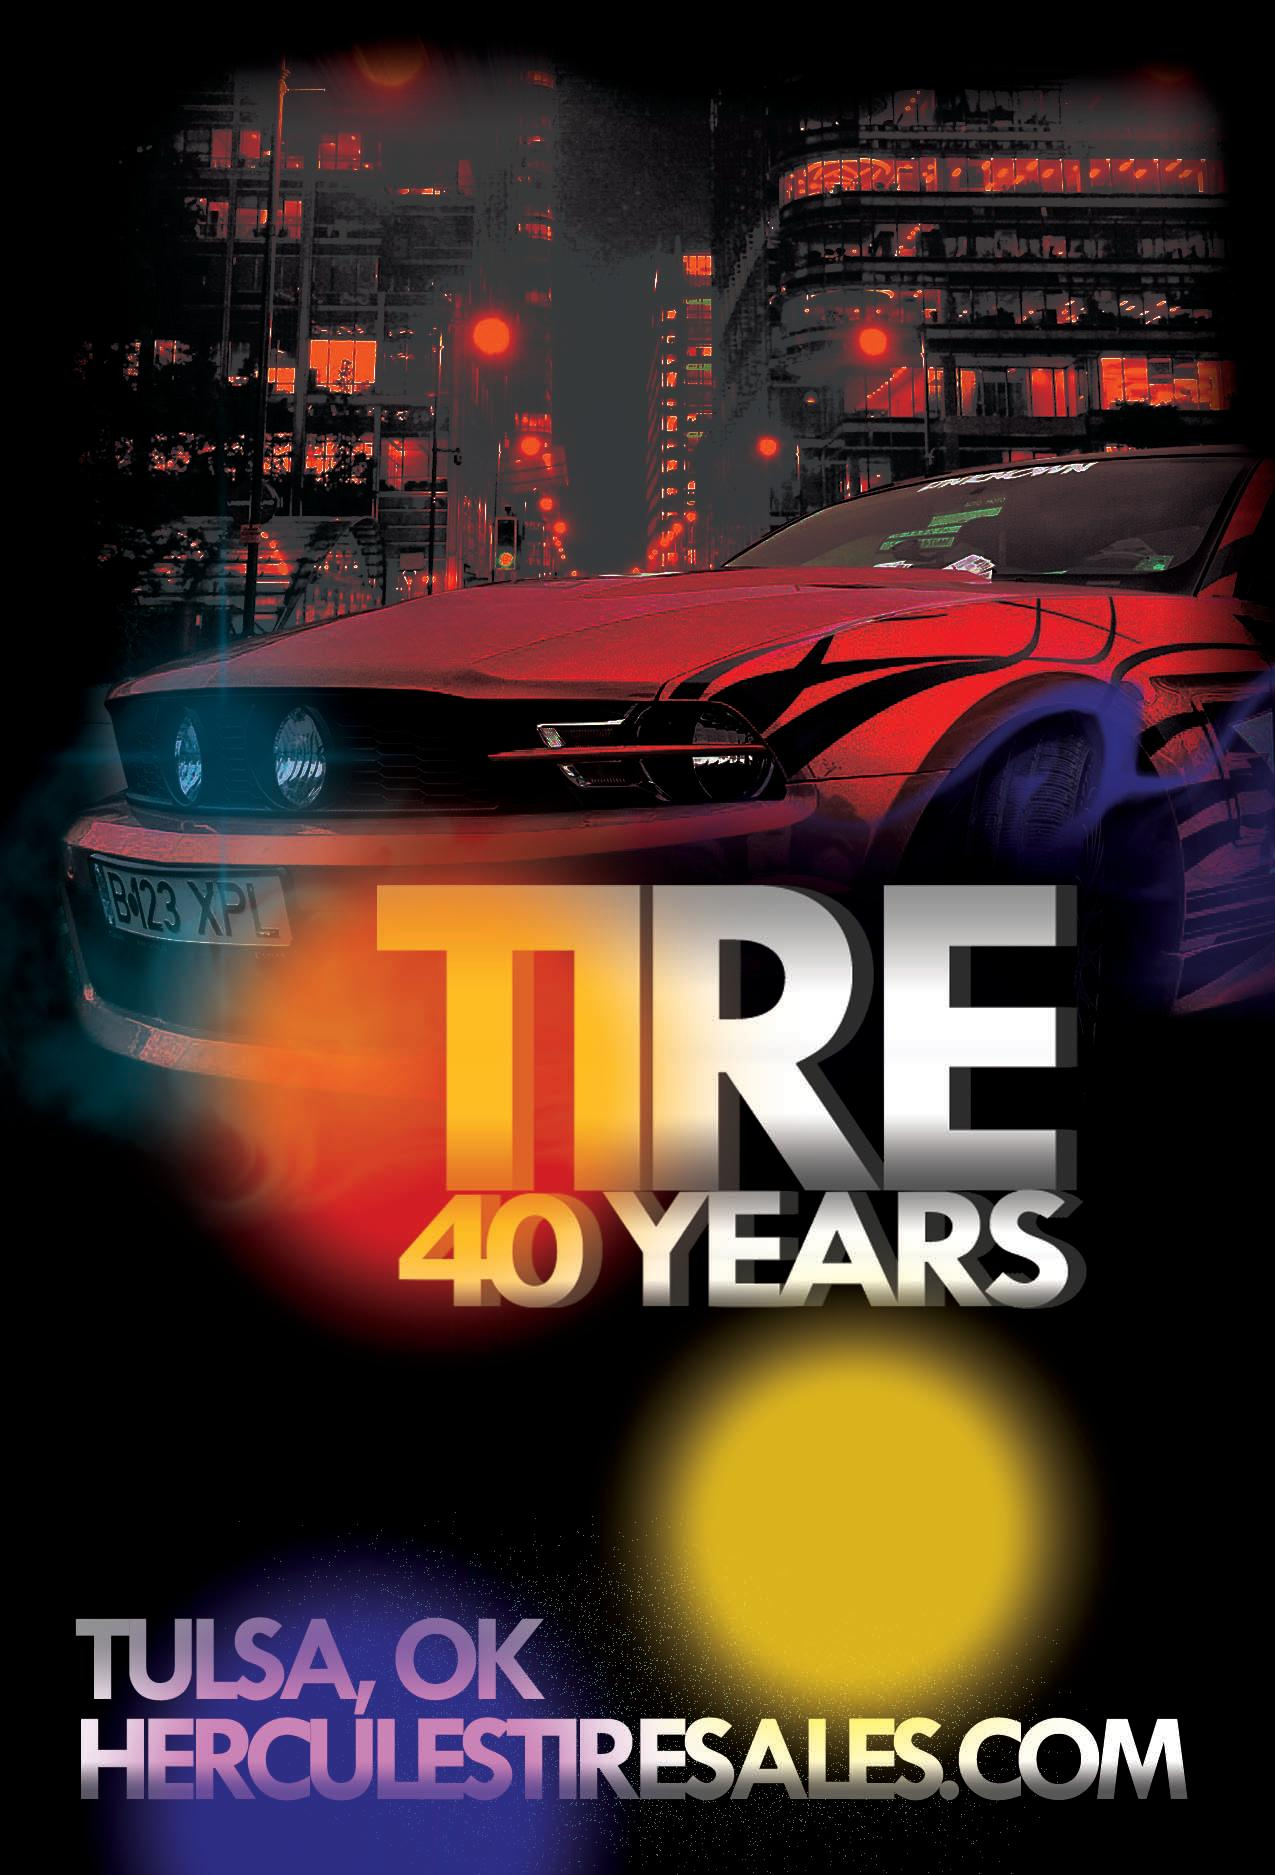 Hercules Tire & Auto Repair image 6